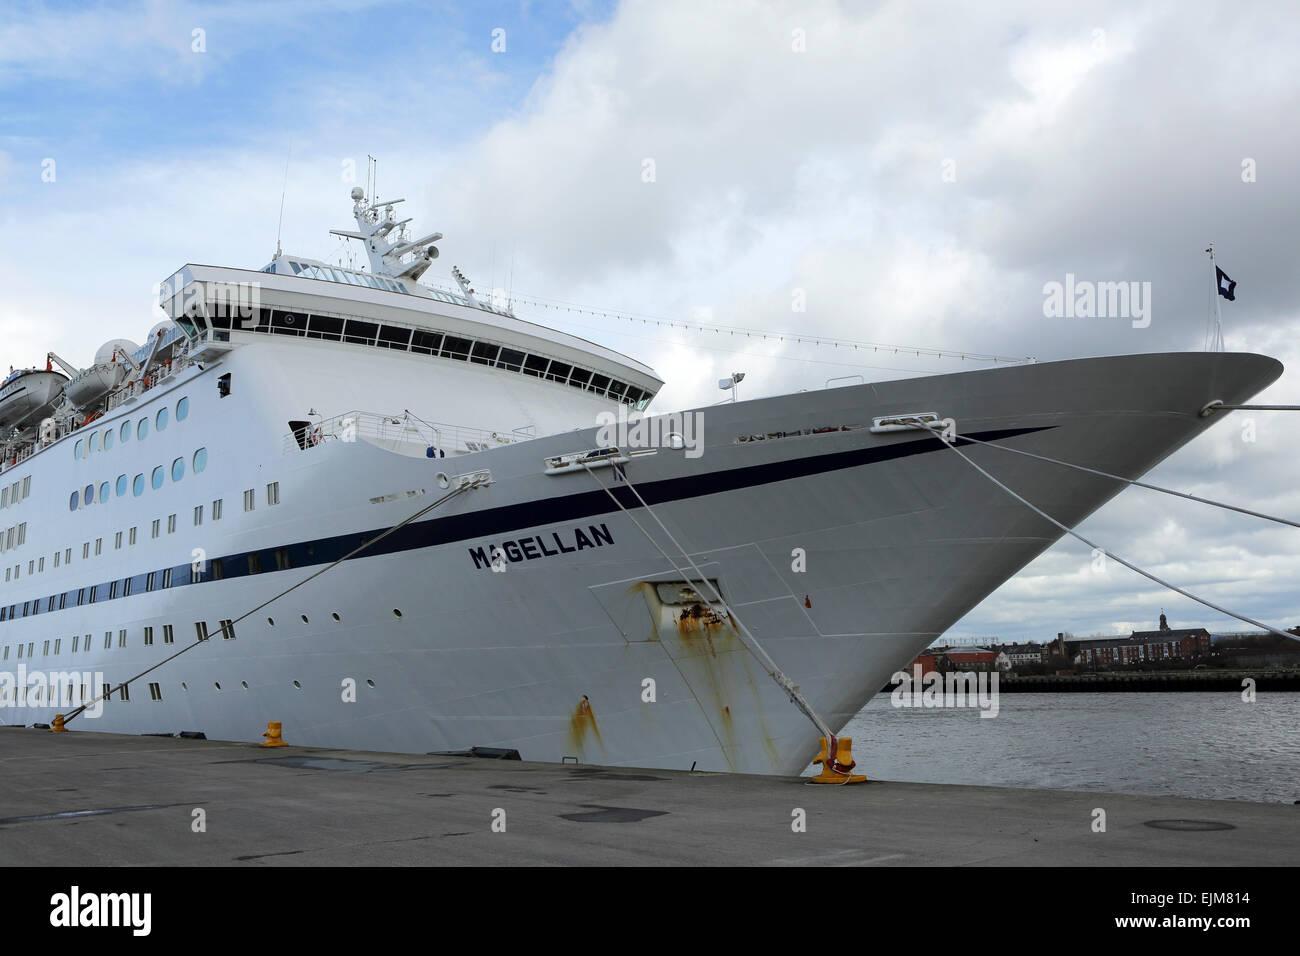 The MS Magellan Cruise Ship Docked At The Port Of Tyne England - Magellan cruise ship